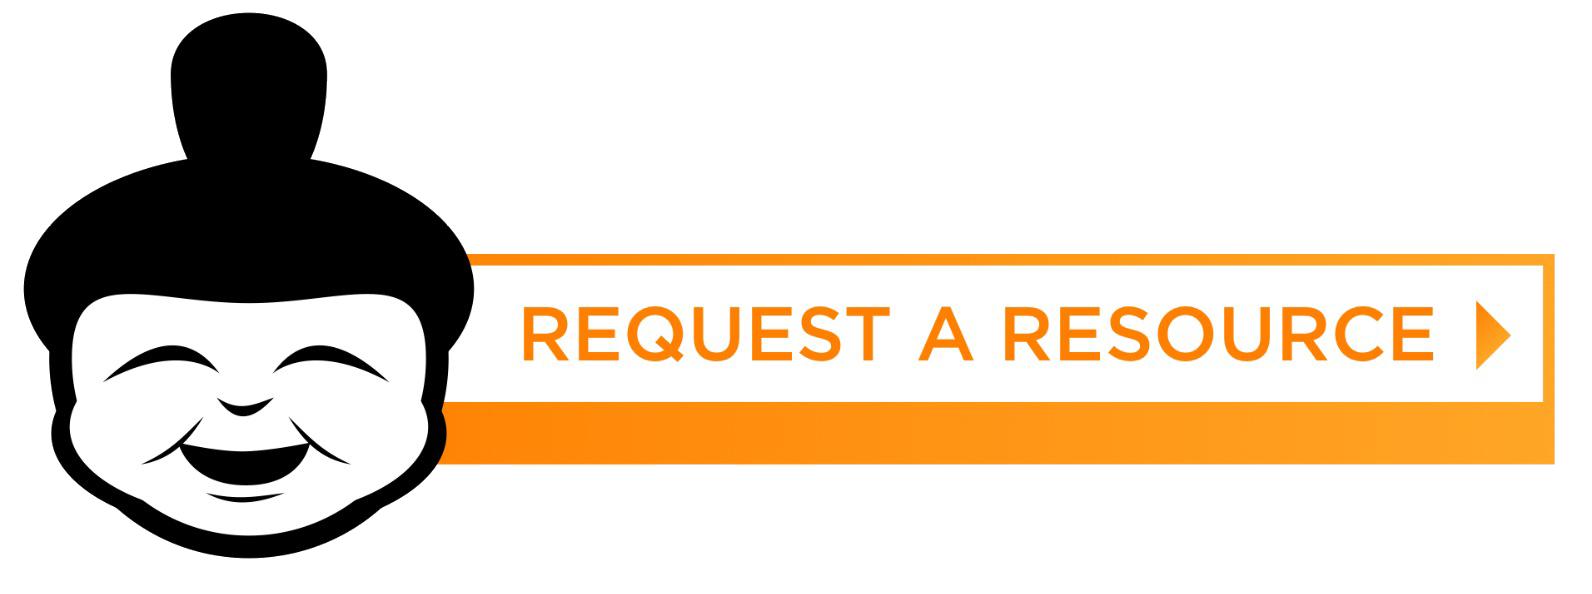 Reqest-a-Resource.png